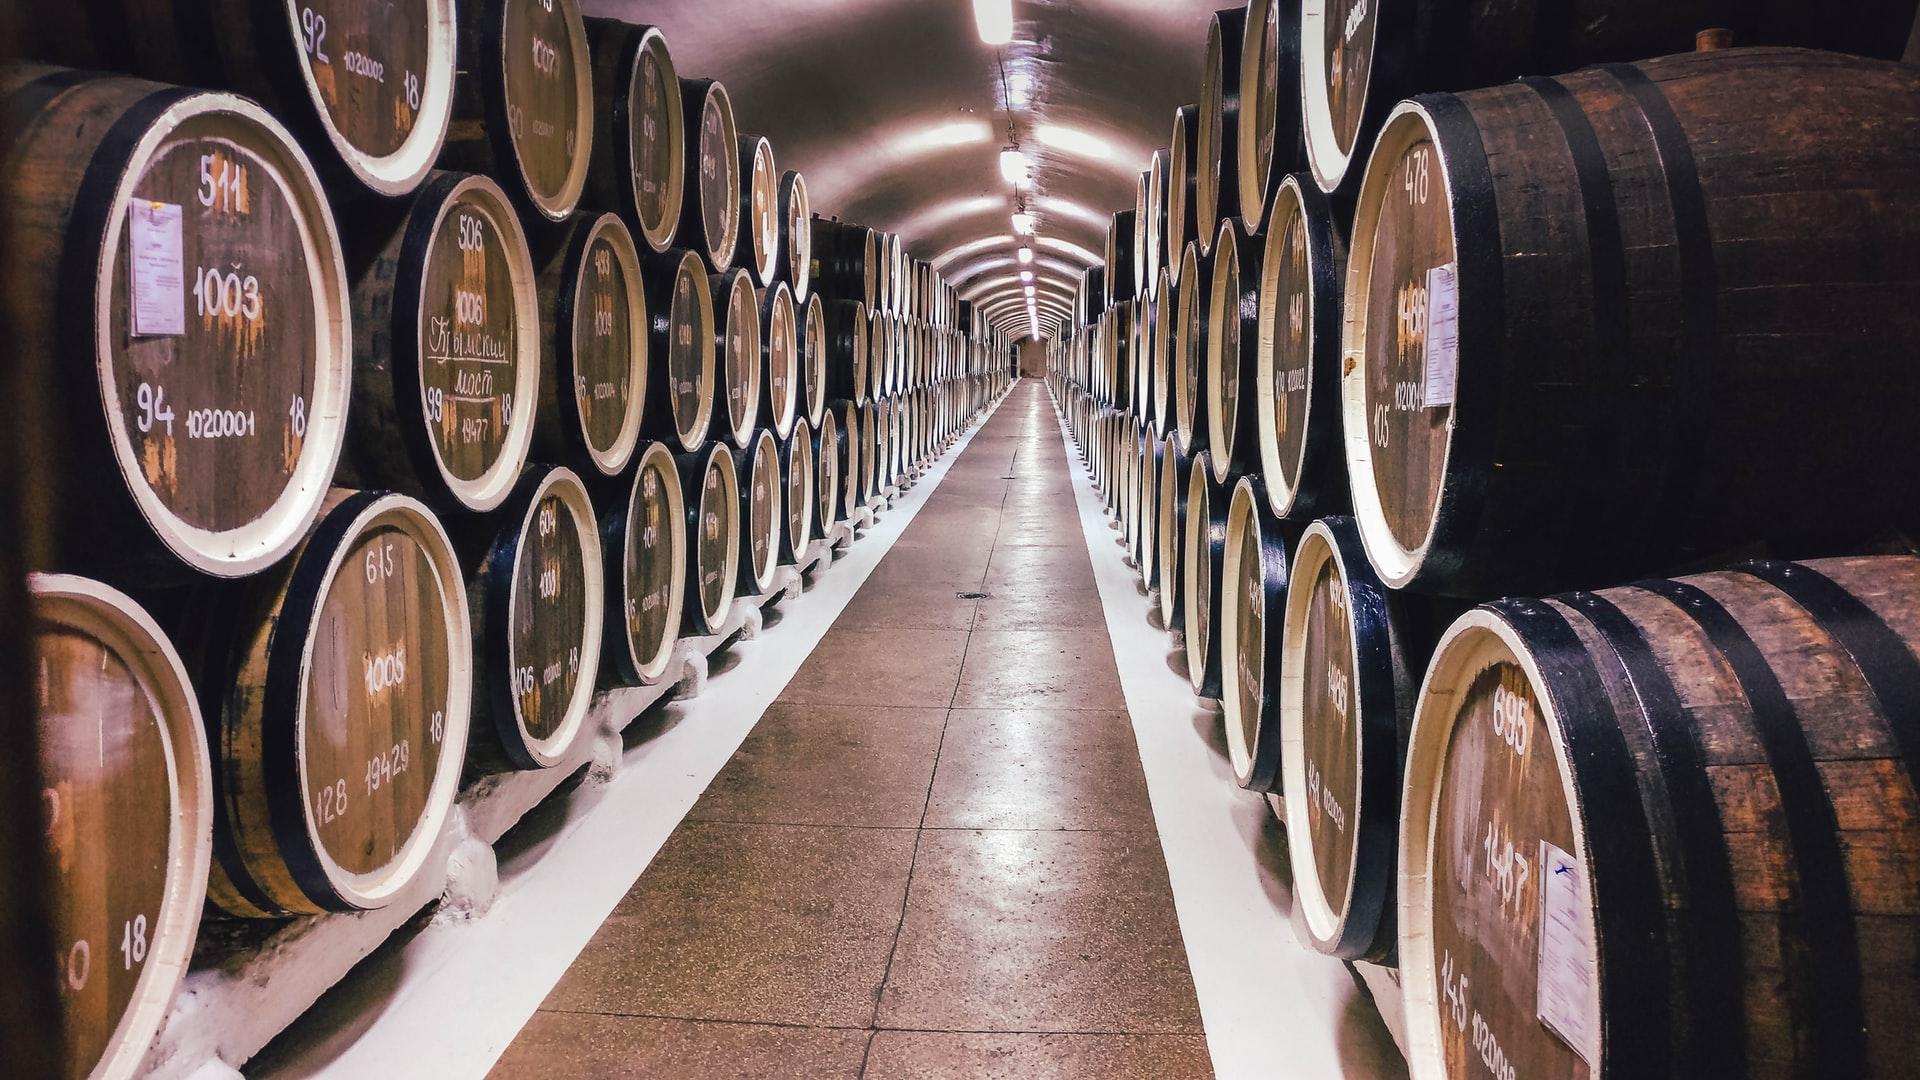 Ljubljana wine travel wine cellar